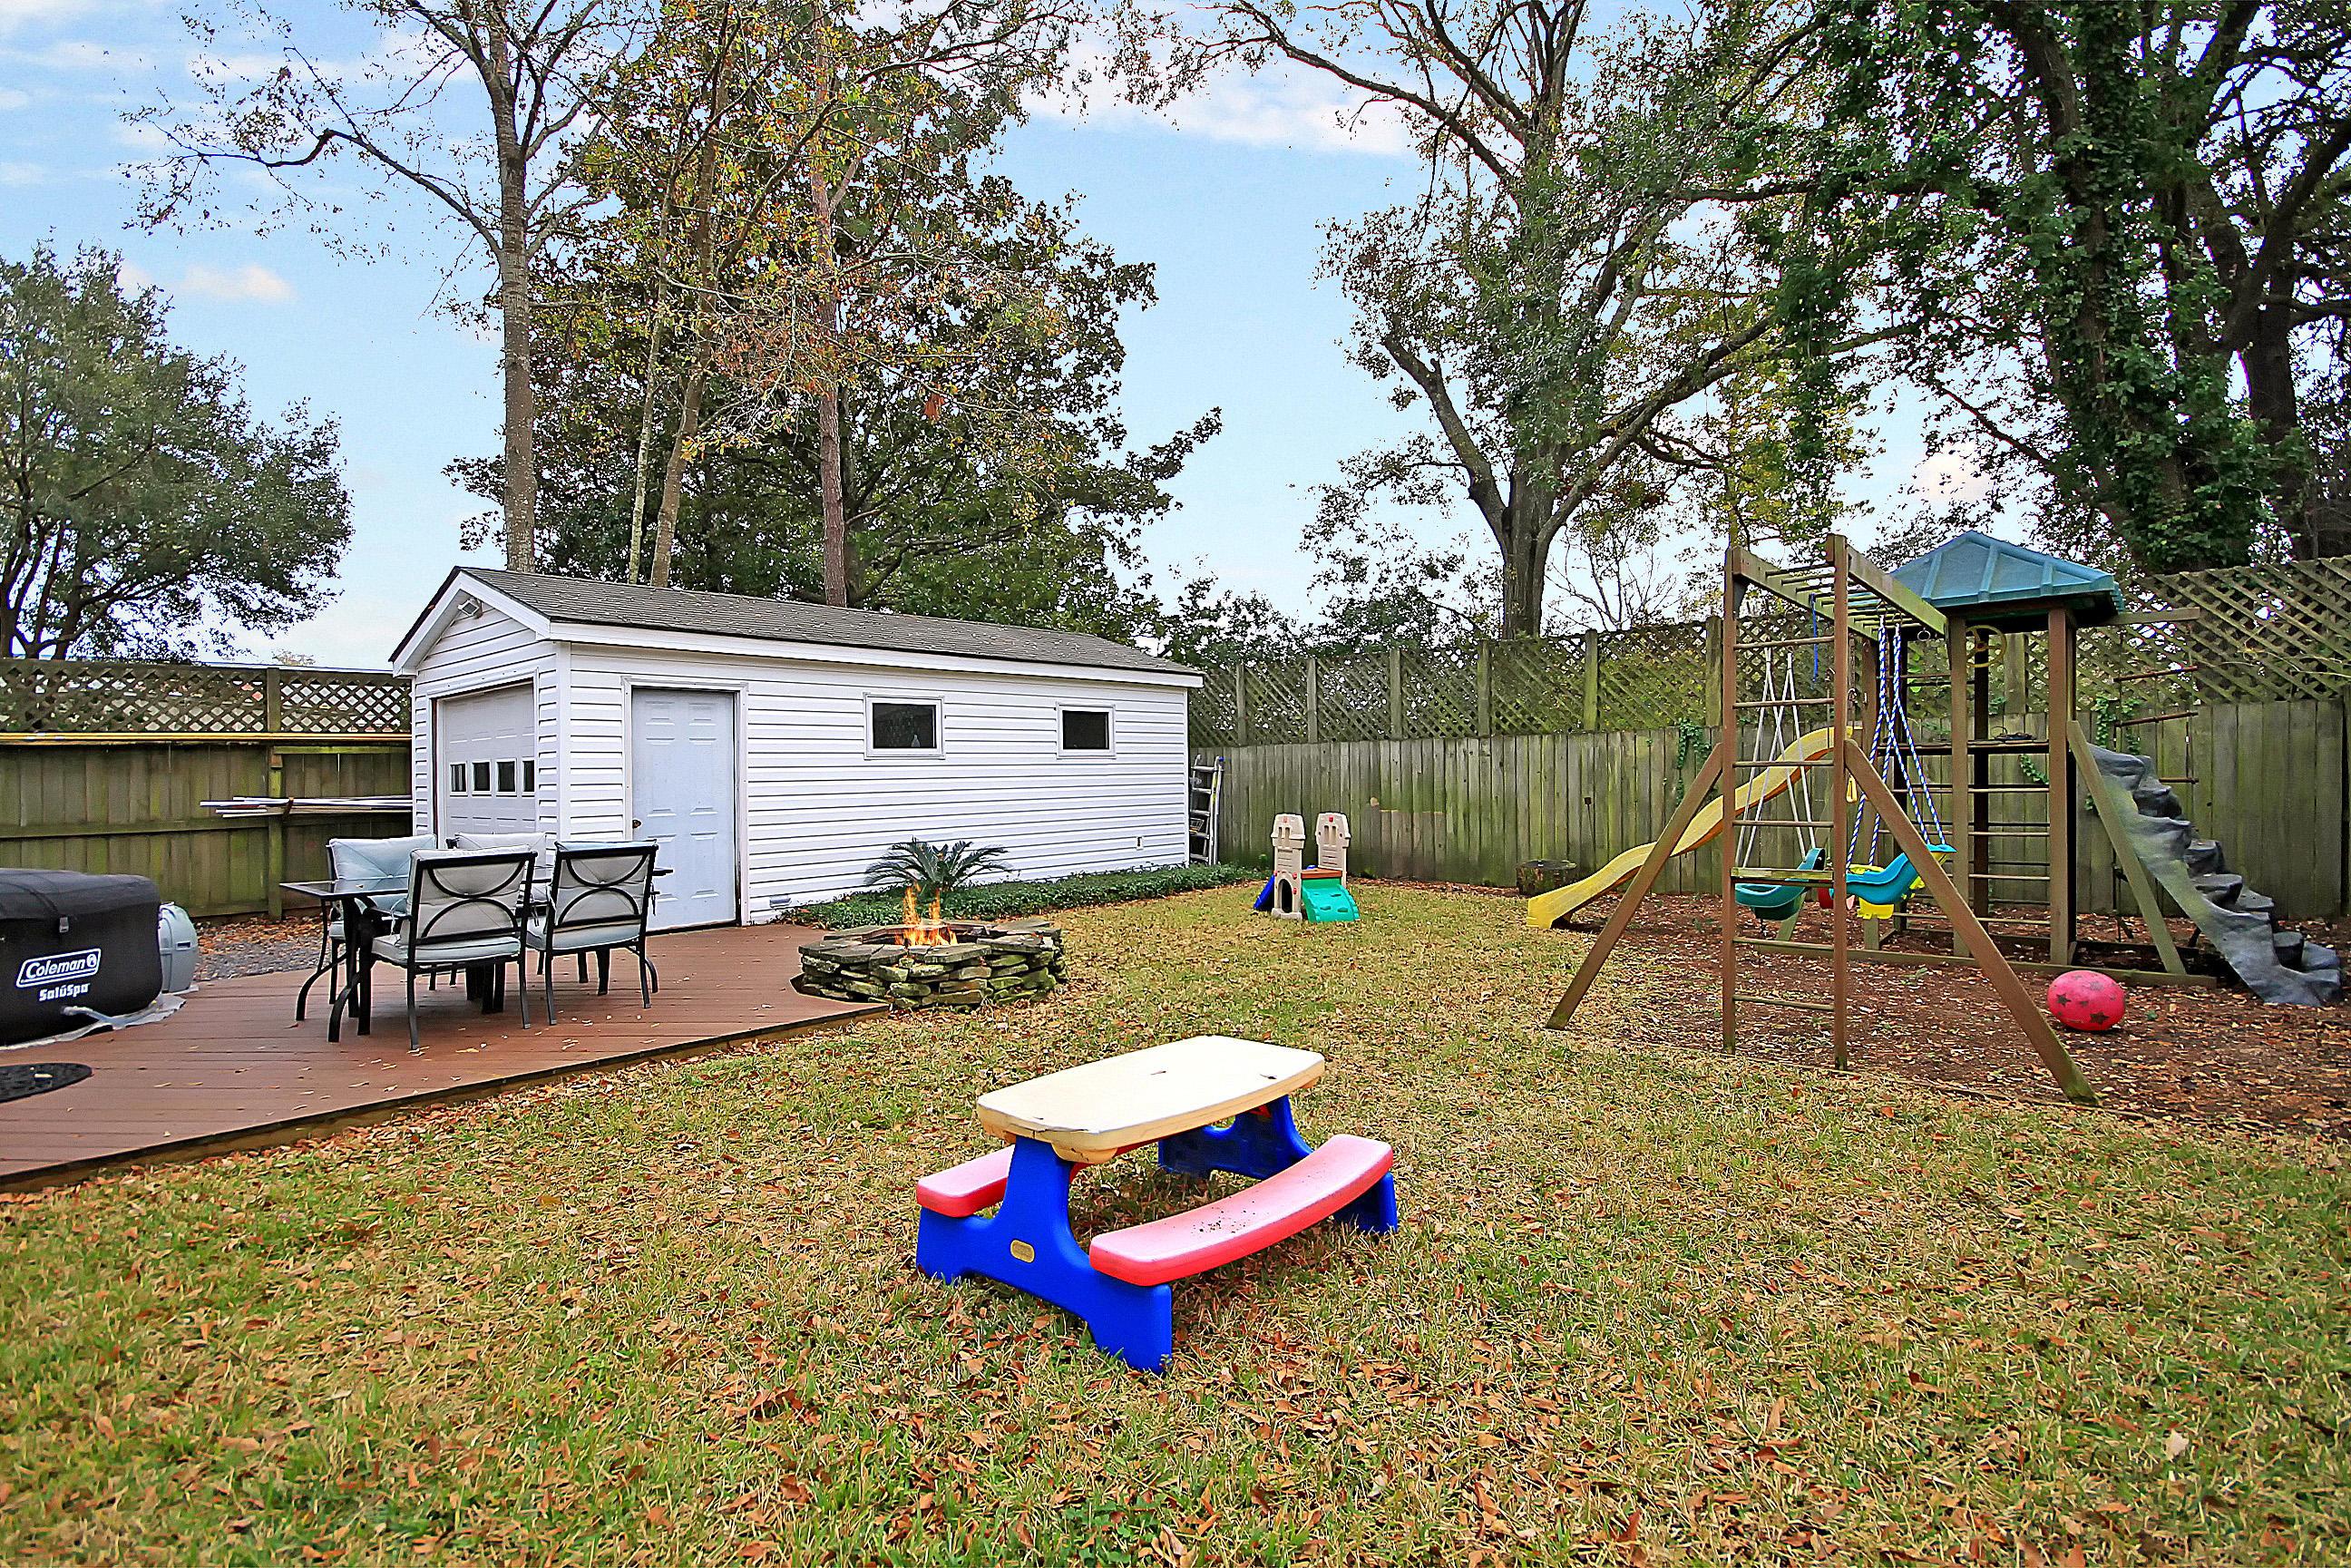 Pinecrest Gardens Homes For Sale - 1607 Pinecrest, Charleston, SC - 26